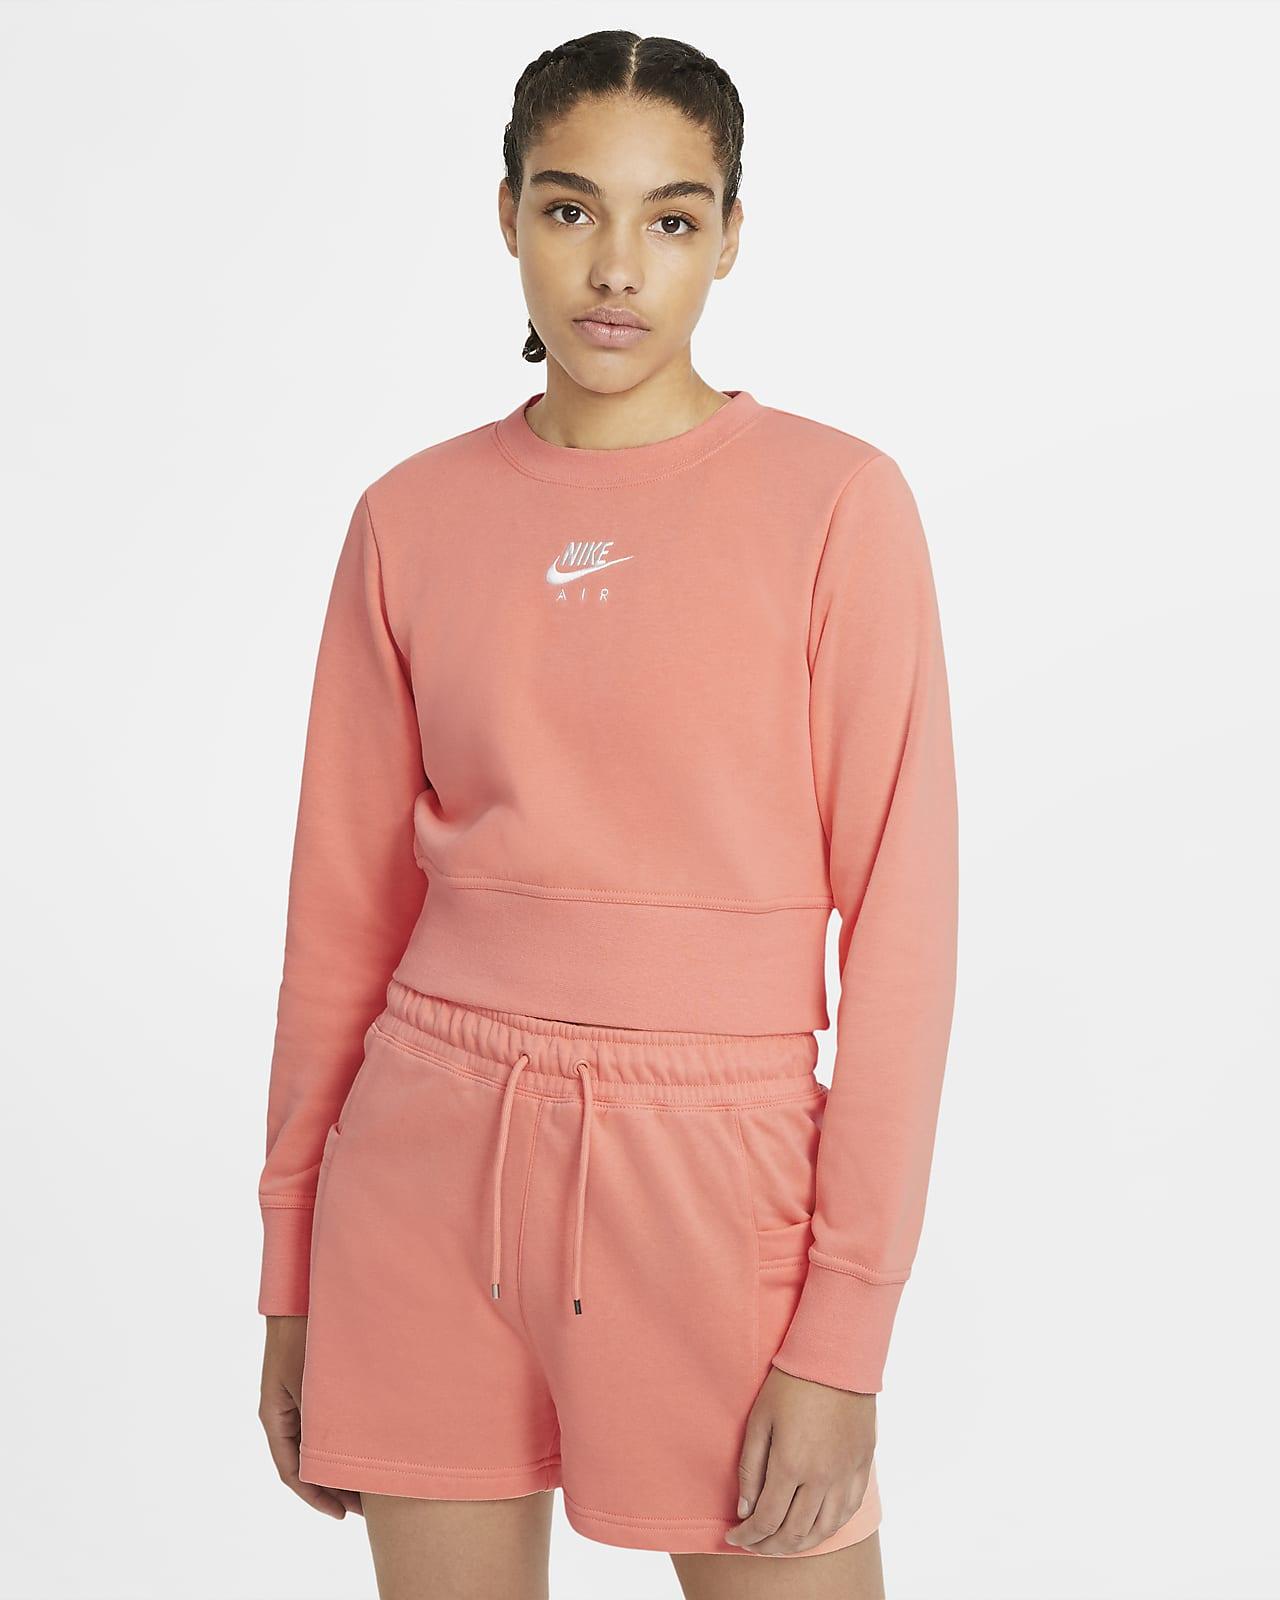 Nike Air Women's Crew